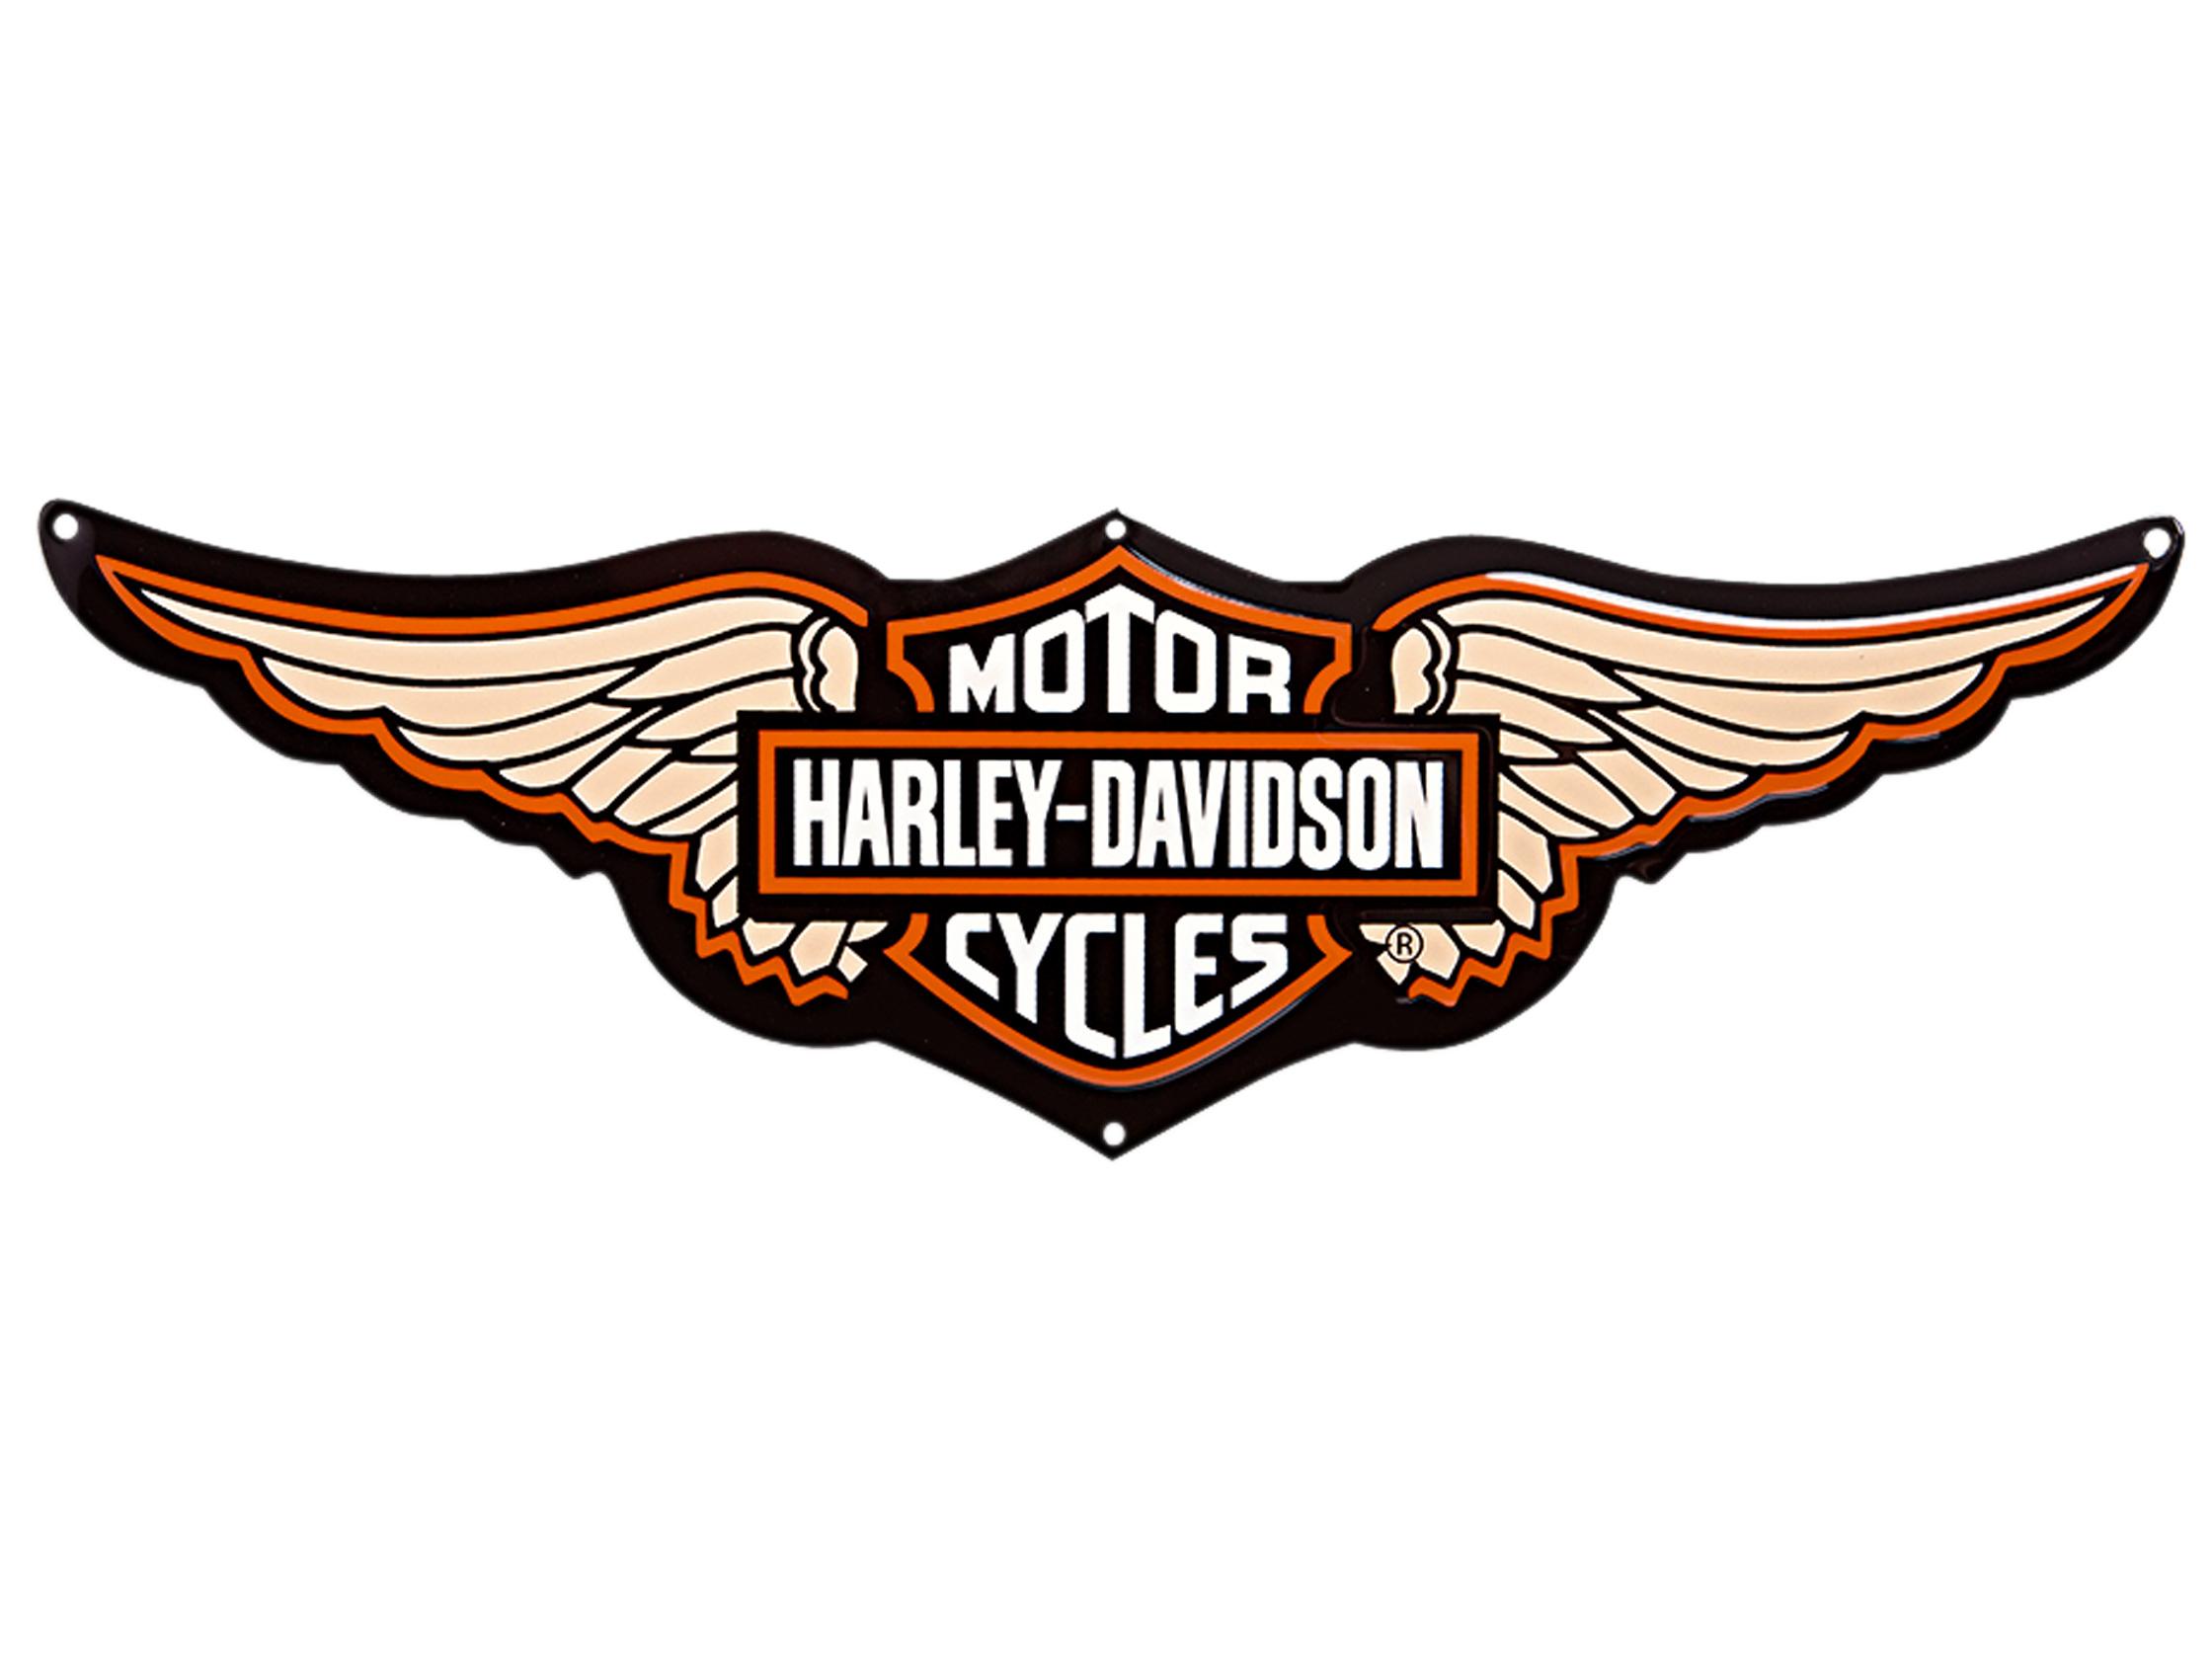 Harley-Davidson Clipart | Fre - Harley Davidson Clipart